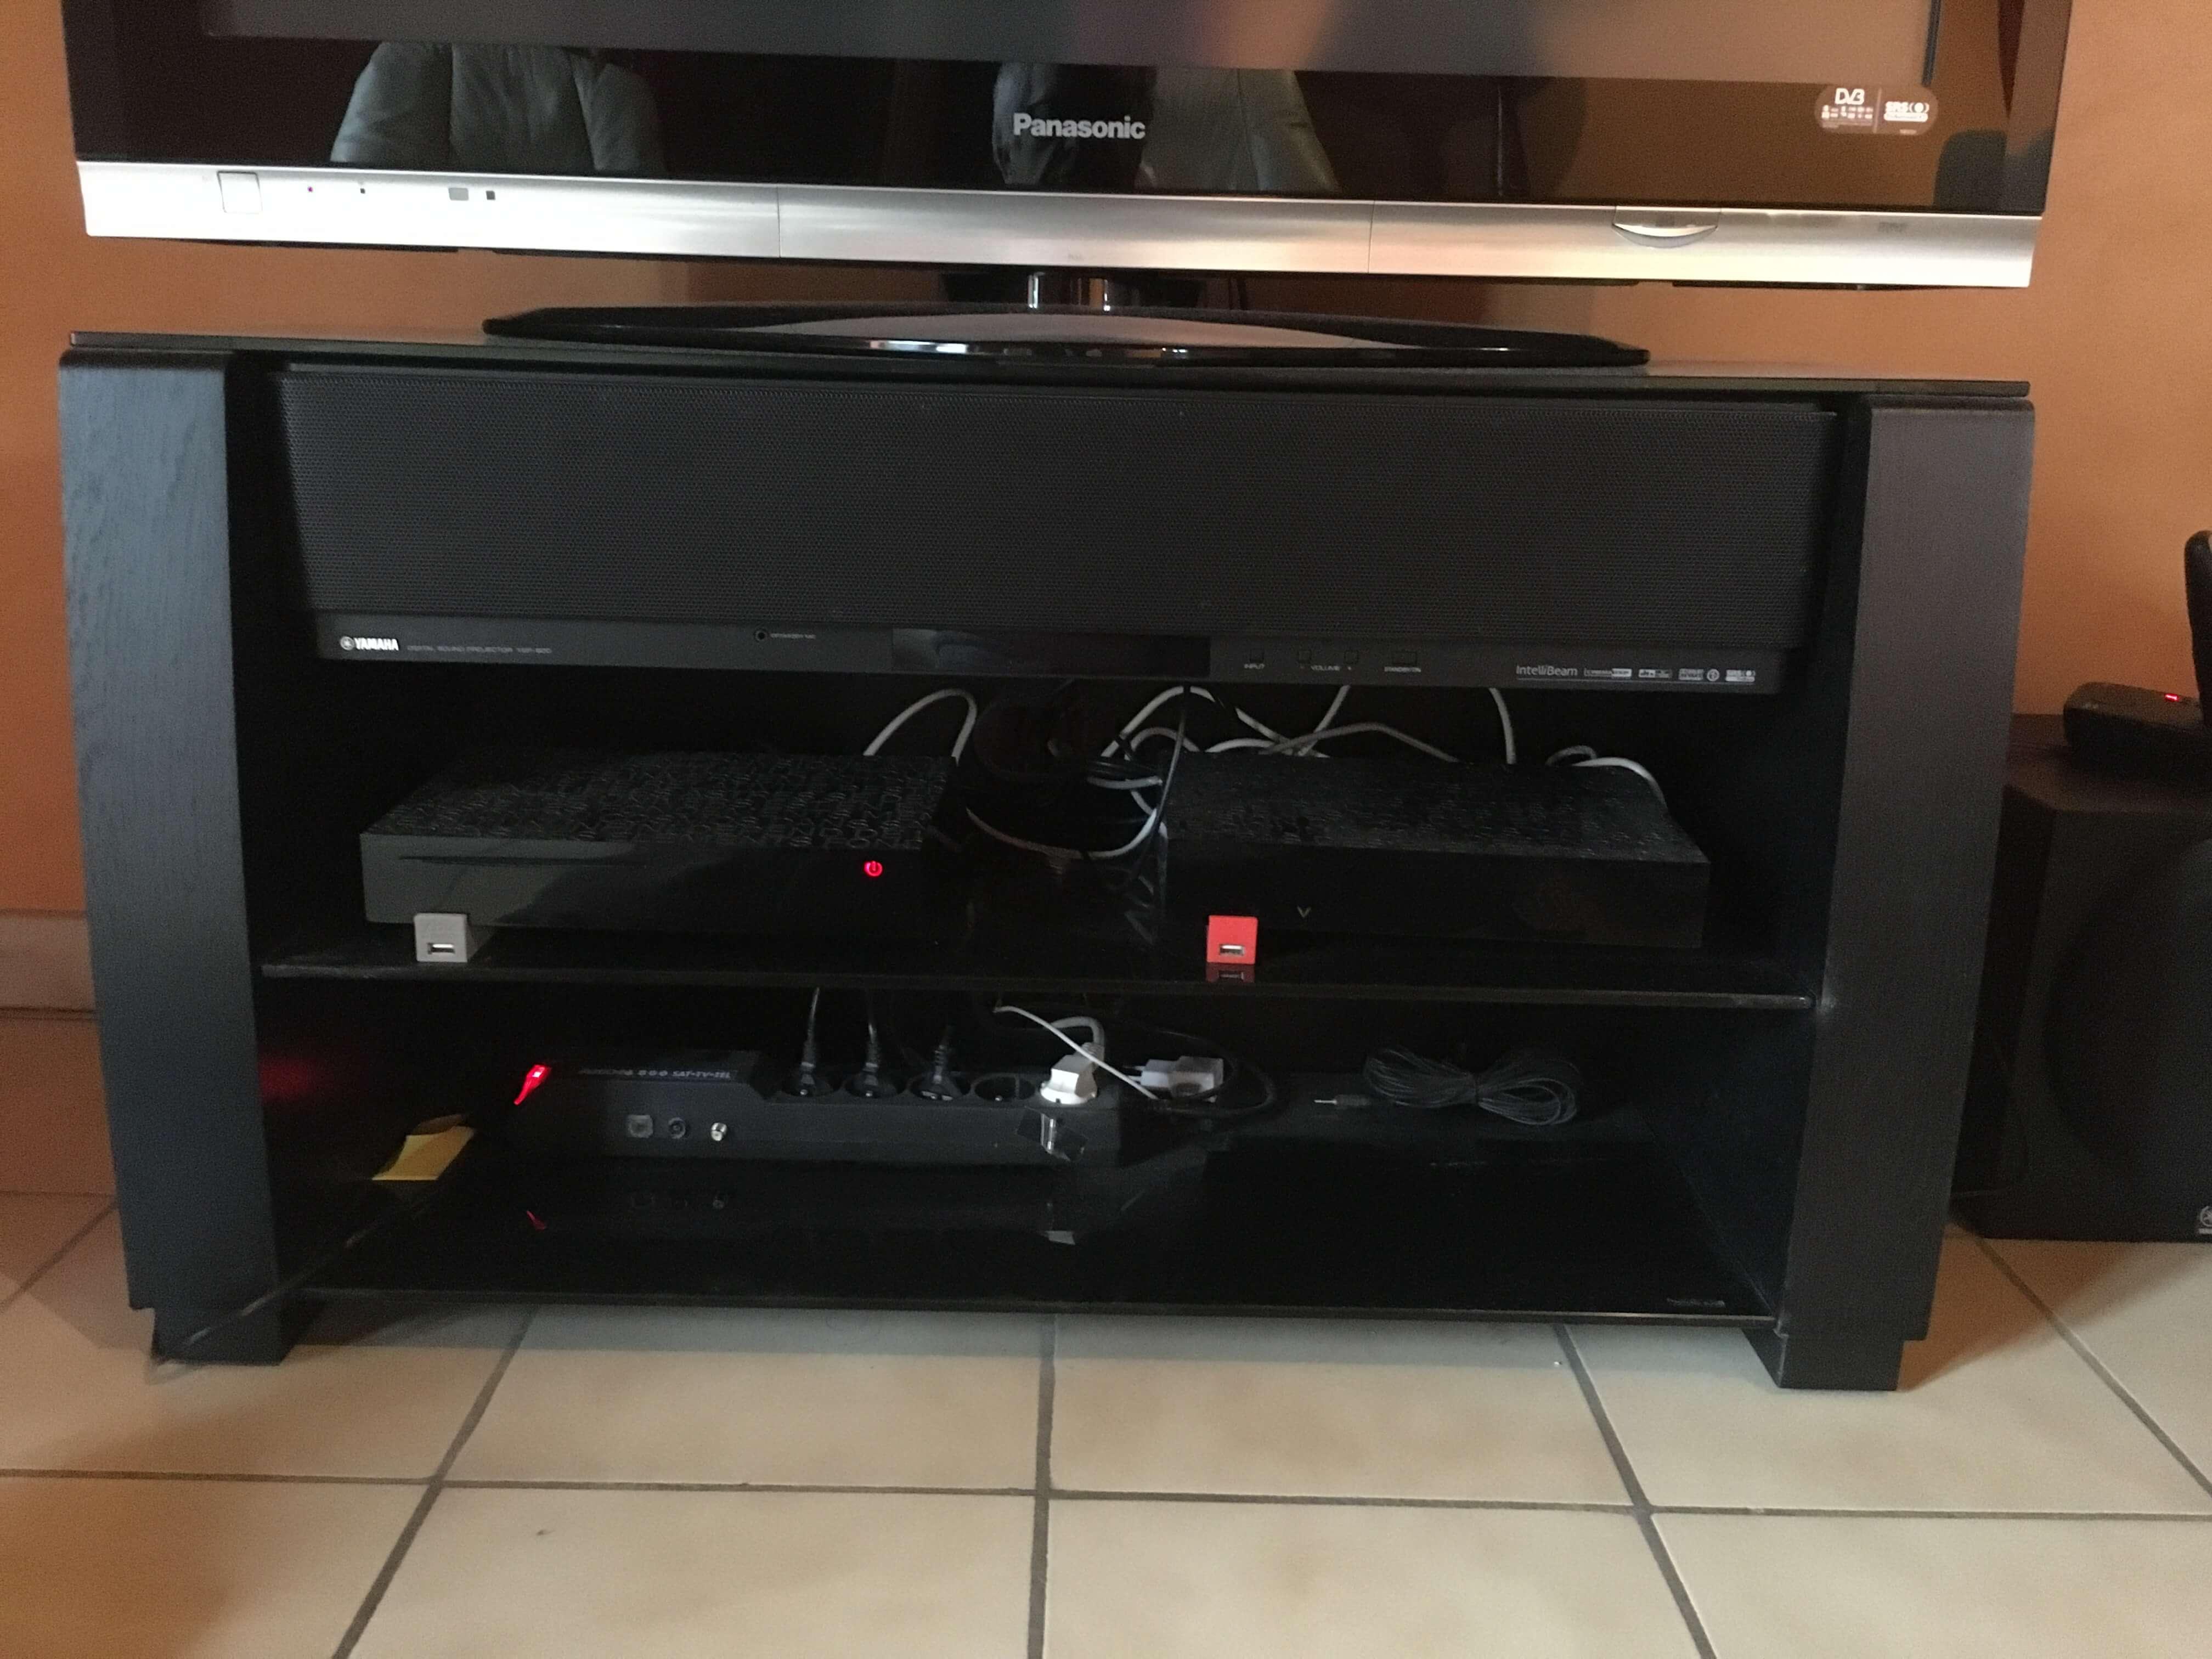 Meuble Tv Hifi Intégré barre de son yamaha ysp-900 avec son meuble tv et caisson de